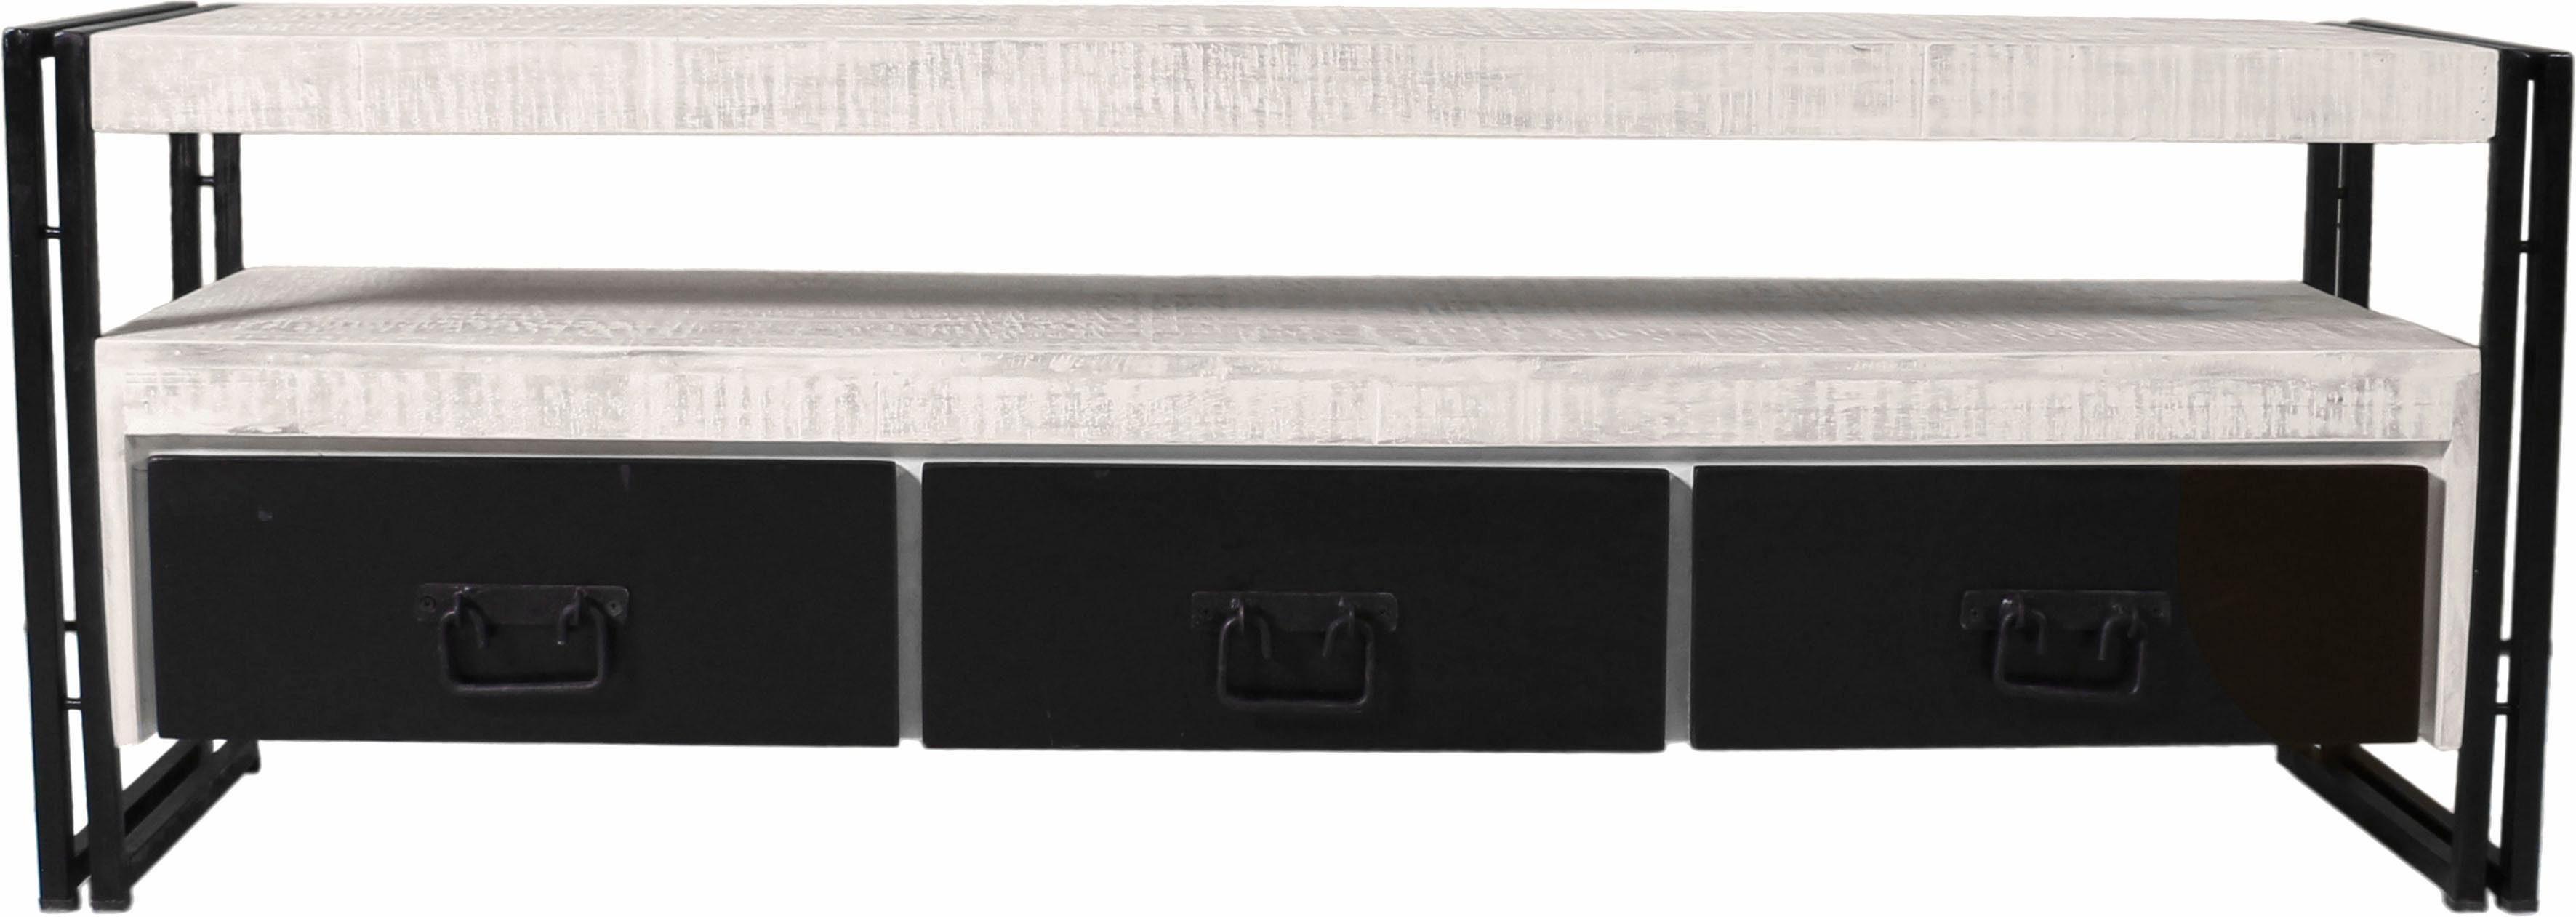 SIT TV-Lowboard »White Panama« im Used Look, Breite 160 cm